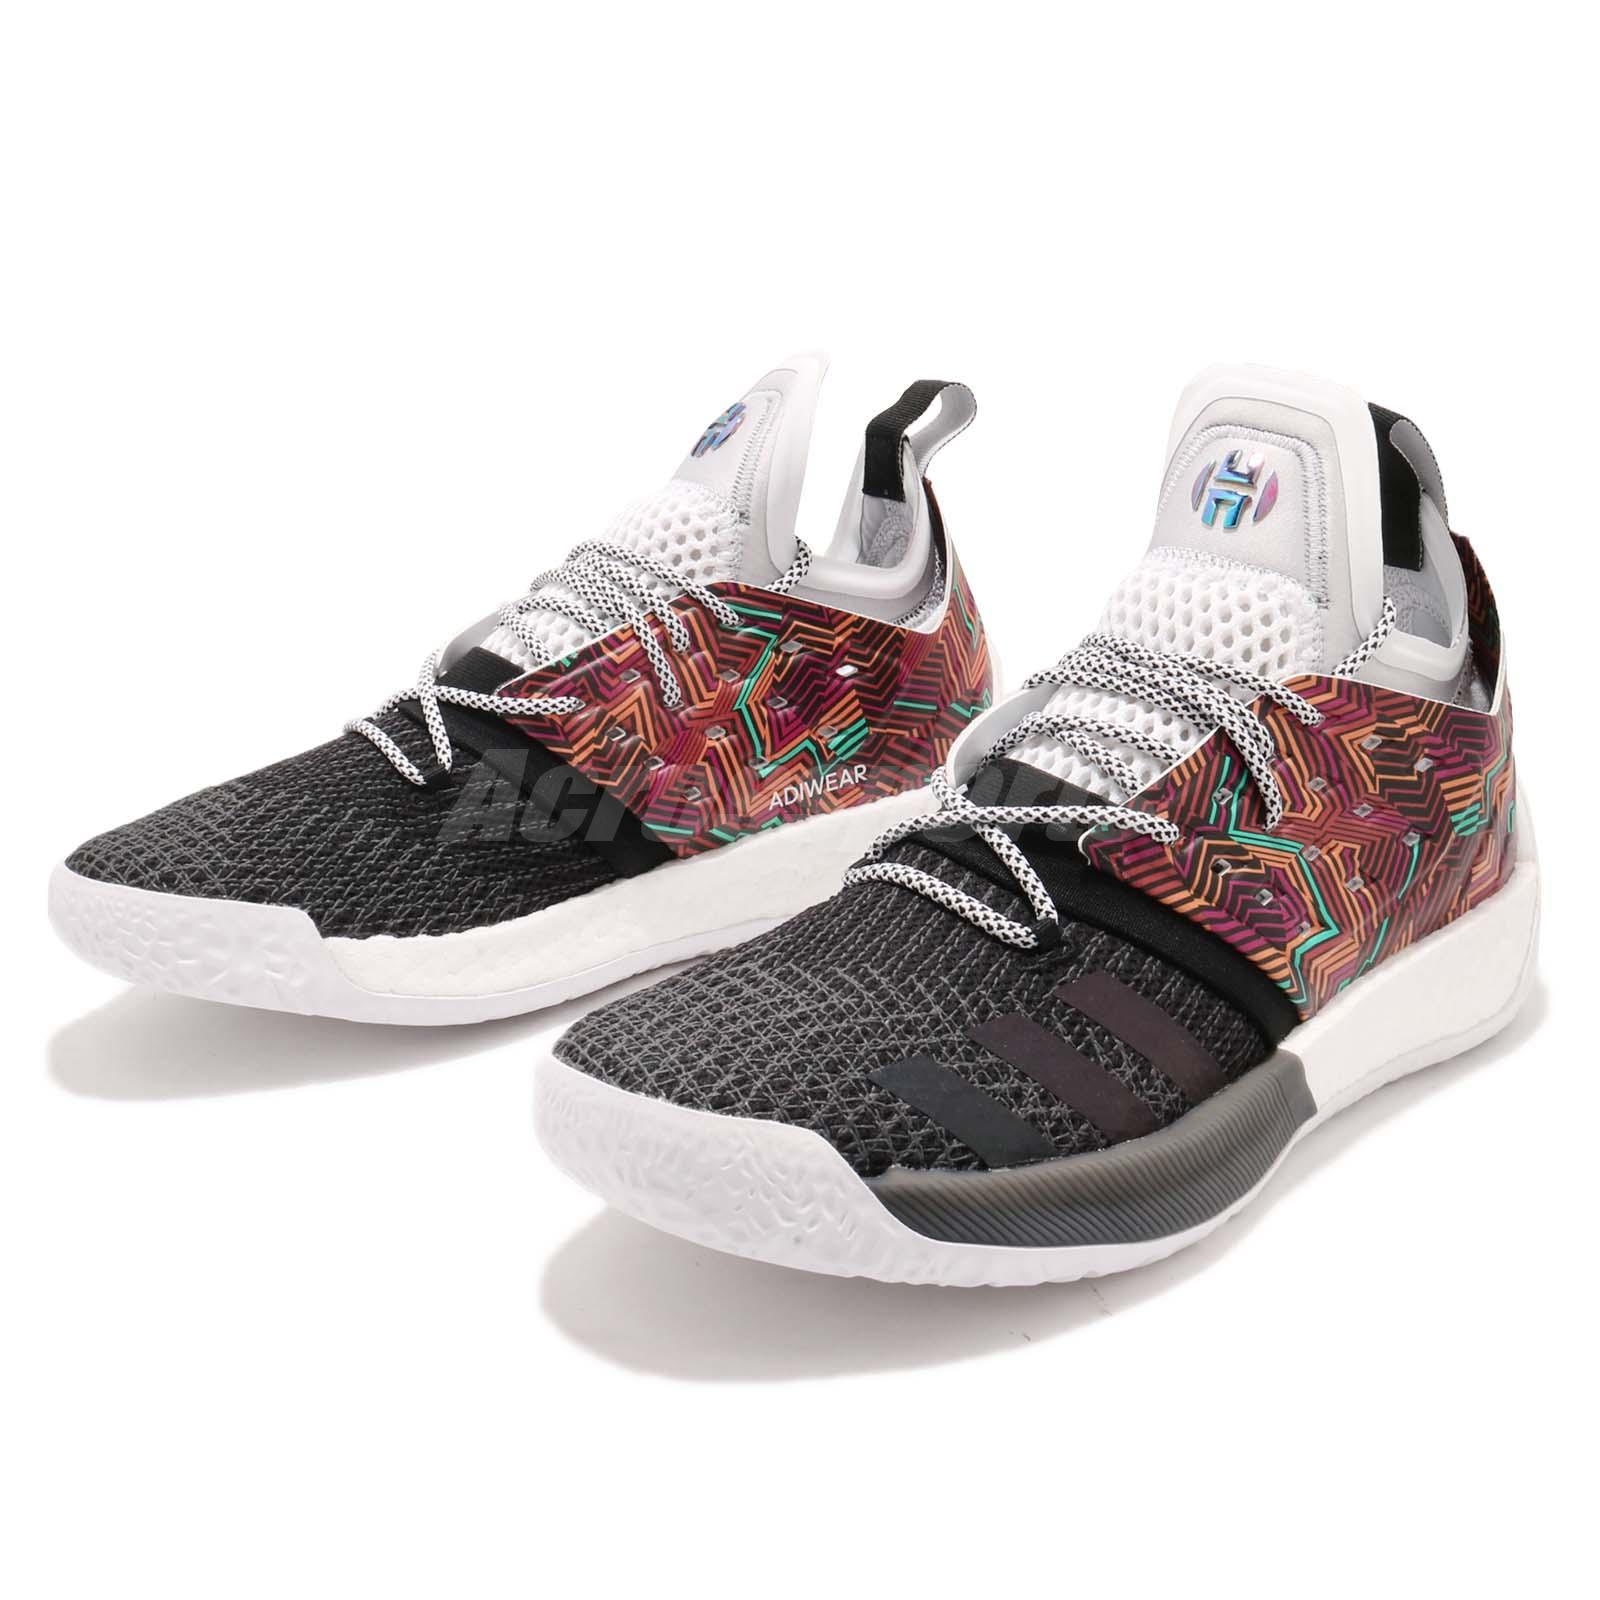 Adidas Harden Vol. 2 II James Summer Pack Boost Multi